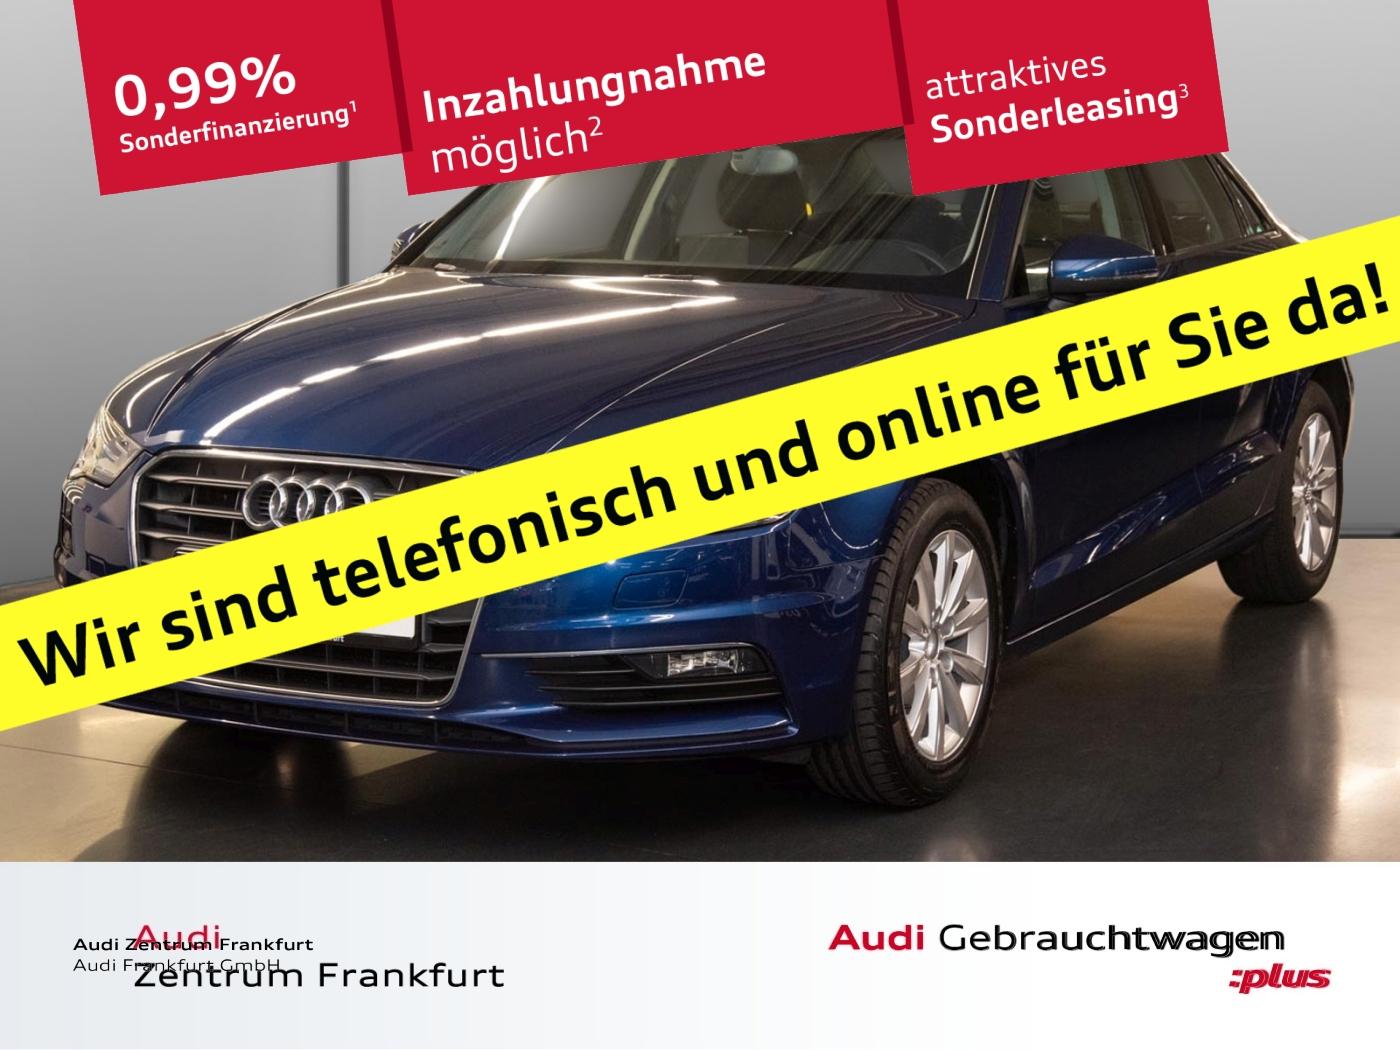 Audi A3 Limousine 1.4 TFSI Xenon PDC Tempomat Bluetoo, Jahr 2015, Benzin